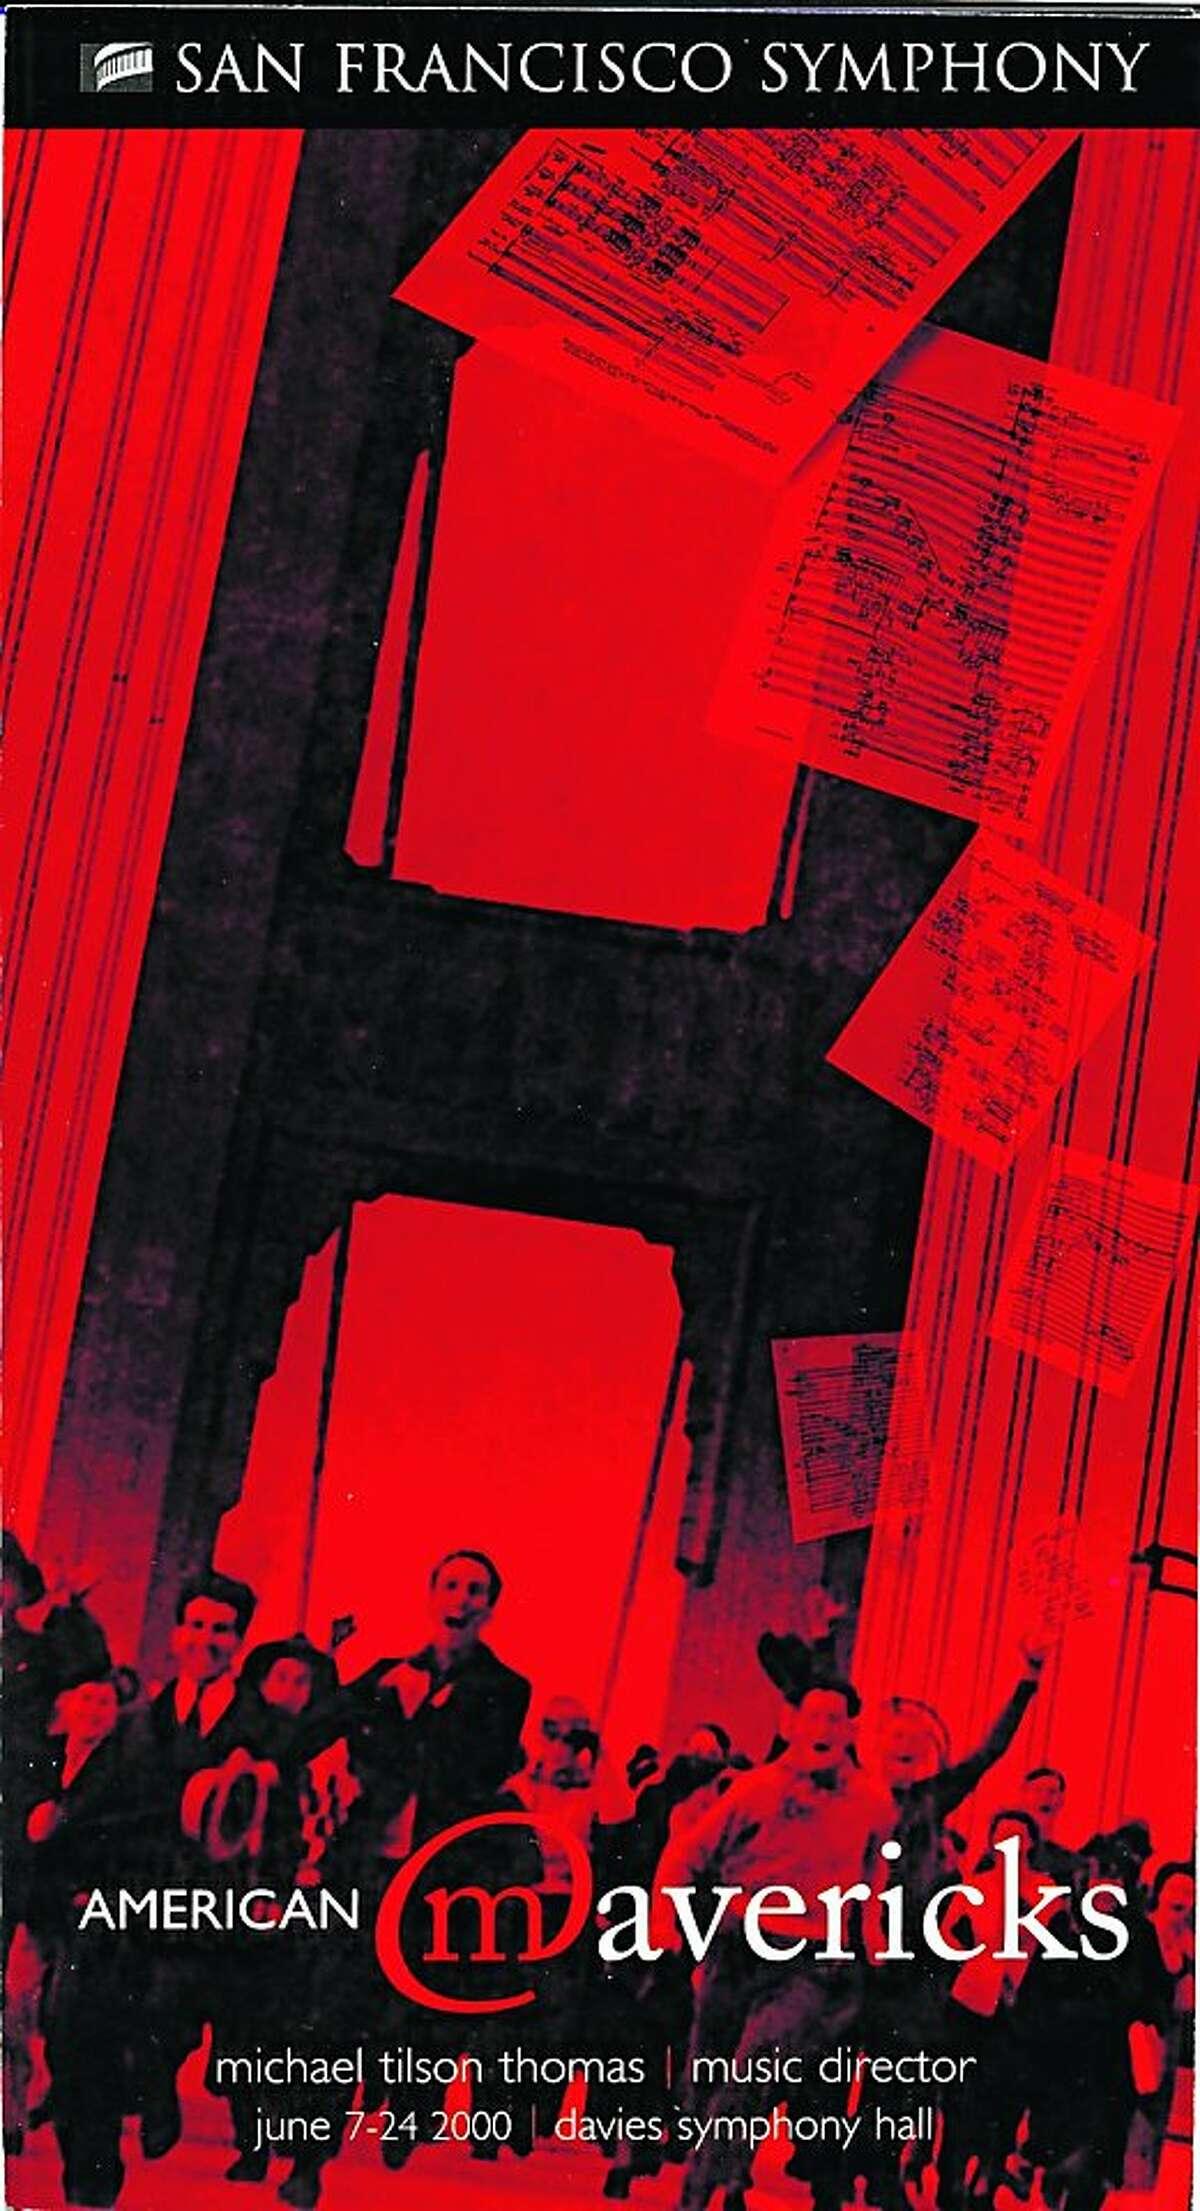 2000 American Mavericks poster.